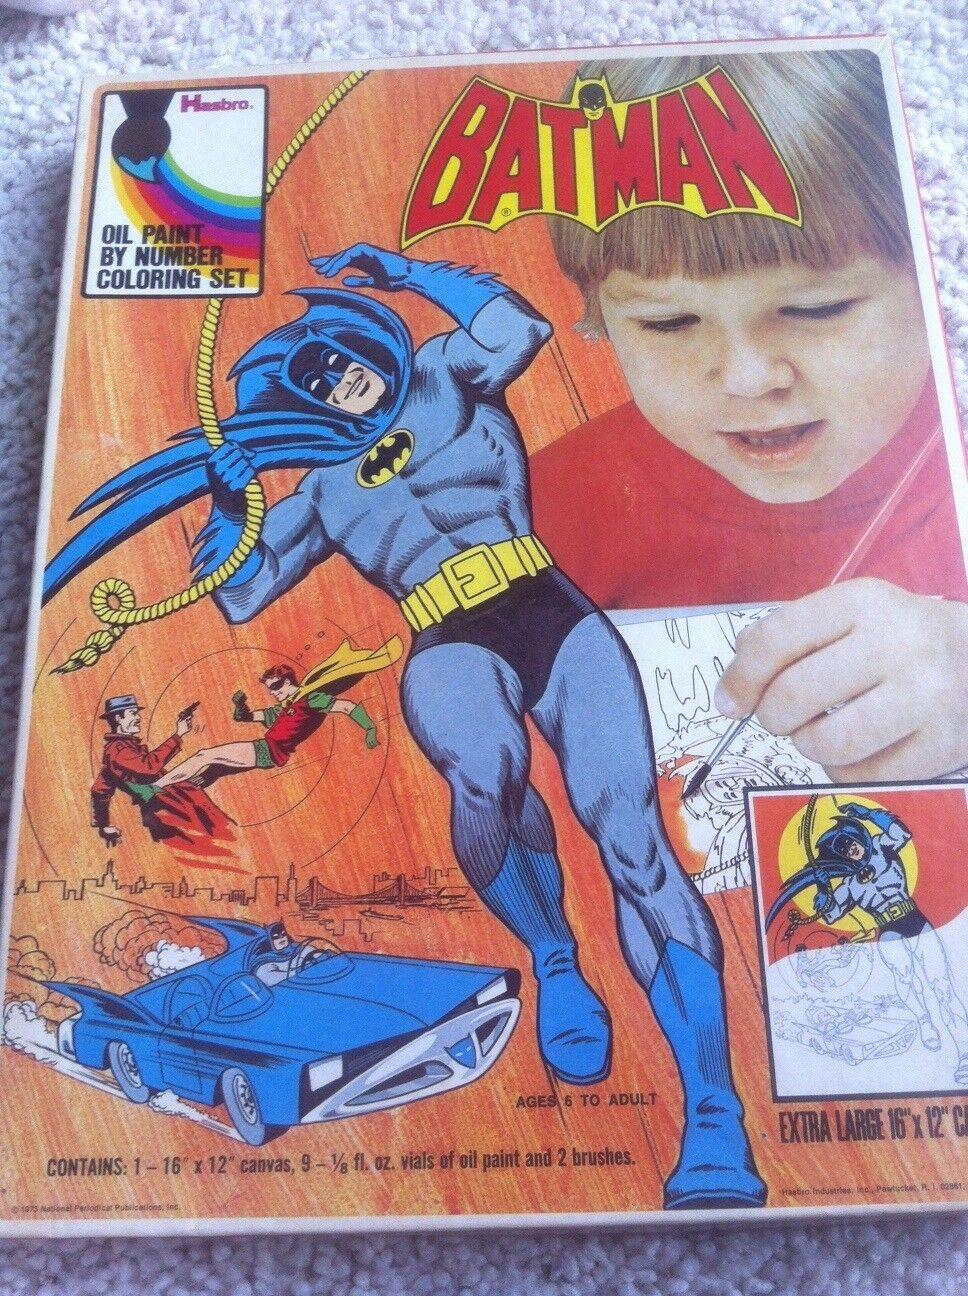 VINTAGE 1973 BATMAN OIL PAINT BY NUMBERS SET  NEVER USED  MIB